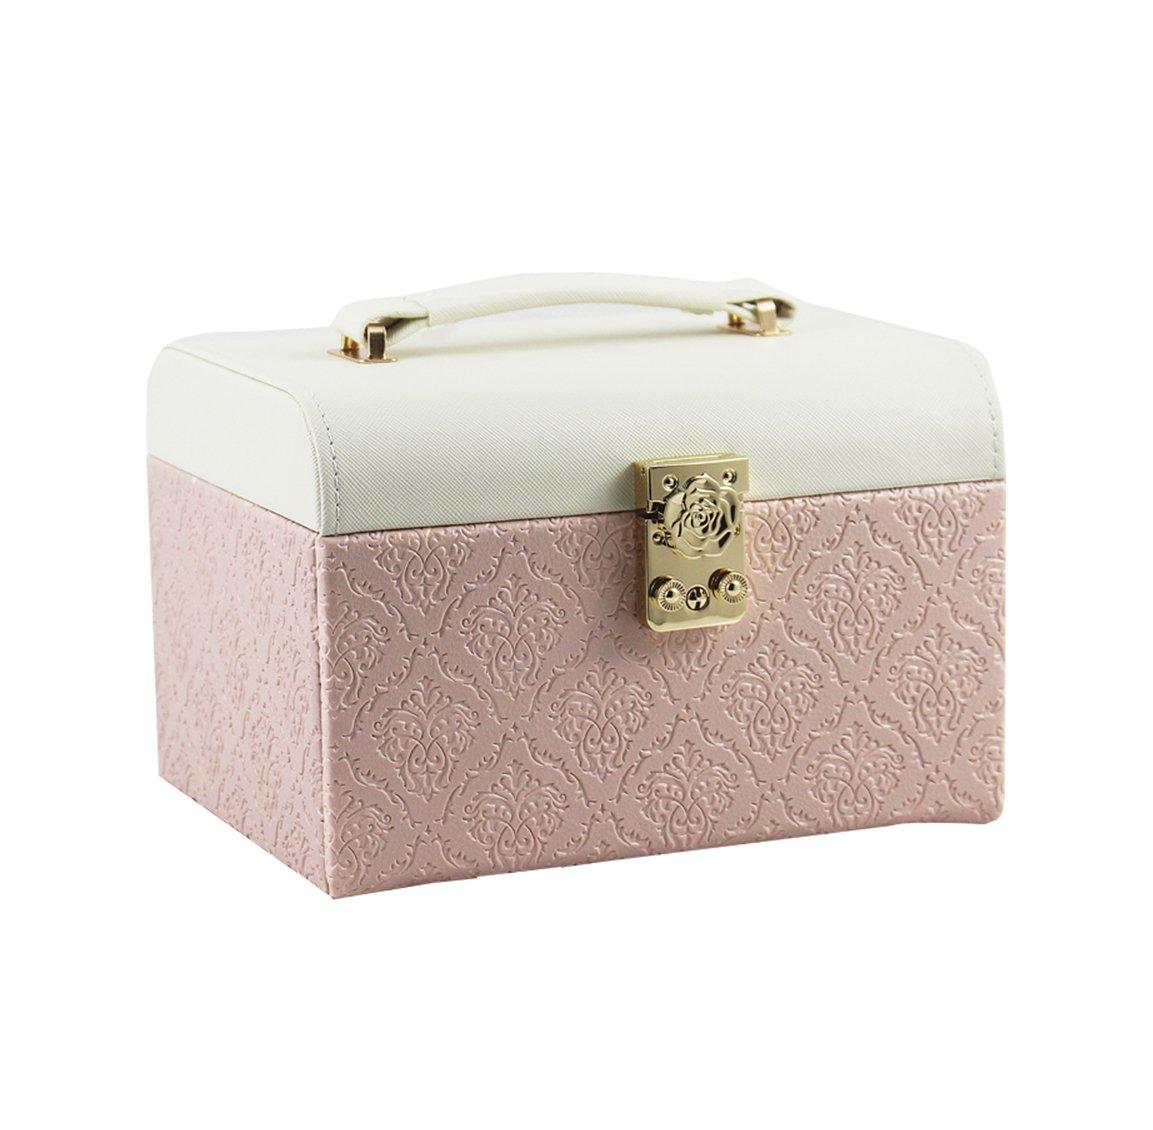 TG Faux Leather Jewelry Box, Necklace Jewelry Bracelet Stud Earrings Earring Ring Organized Storage Box Case Lockable Portable Wood, Pu Pink (201614Cm)